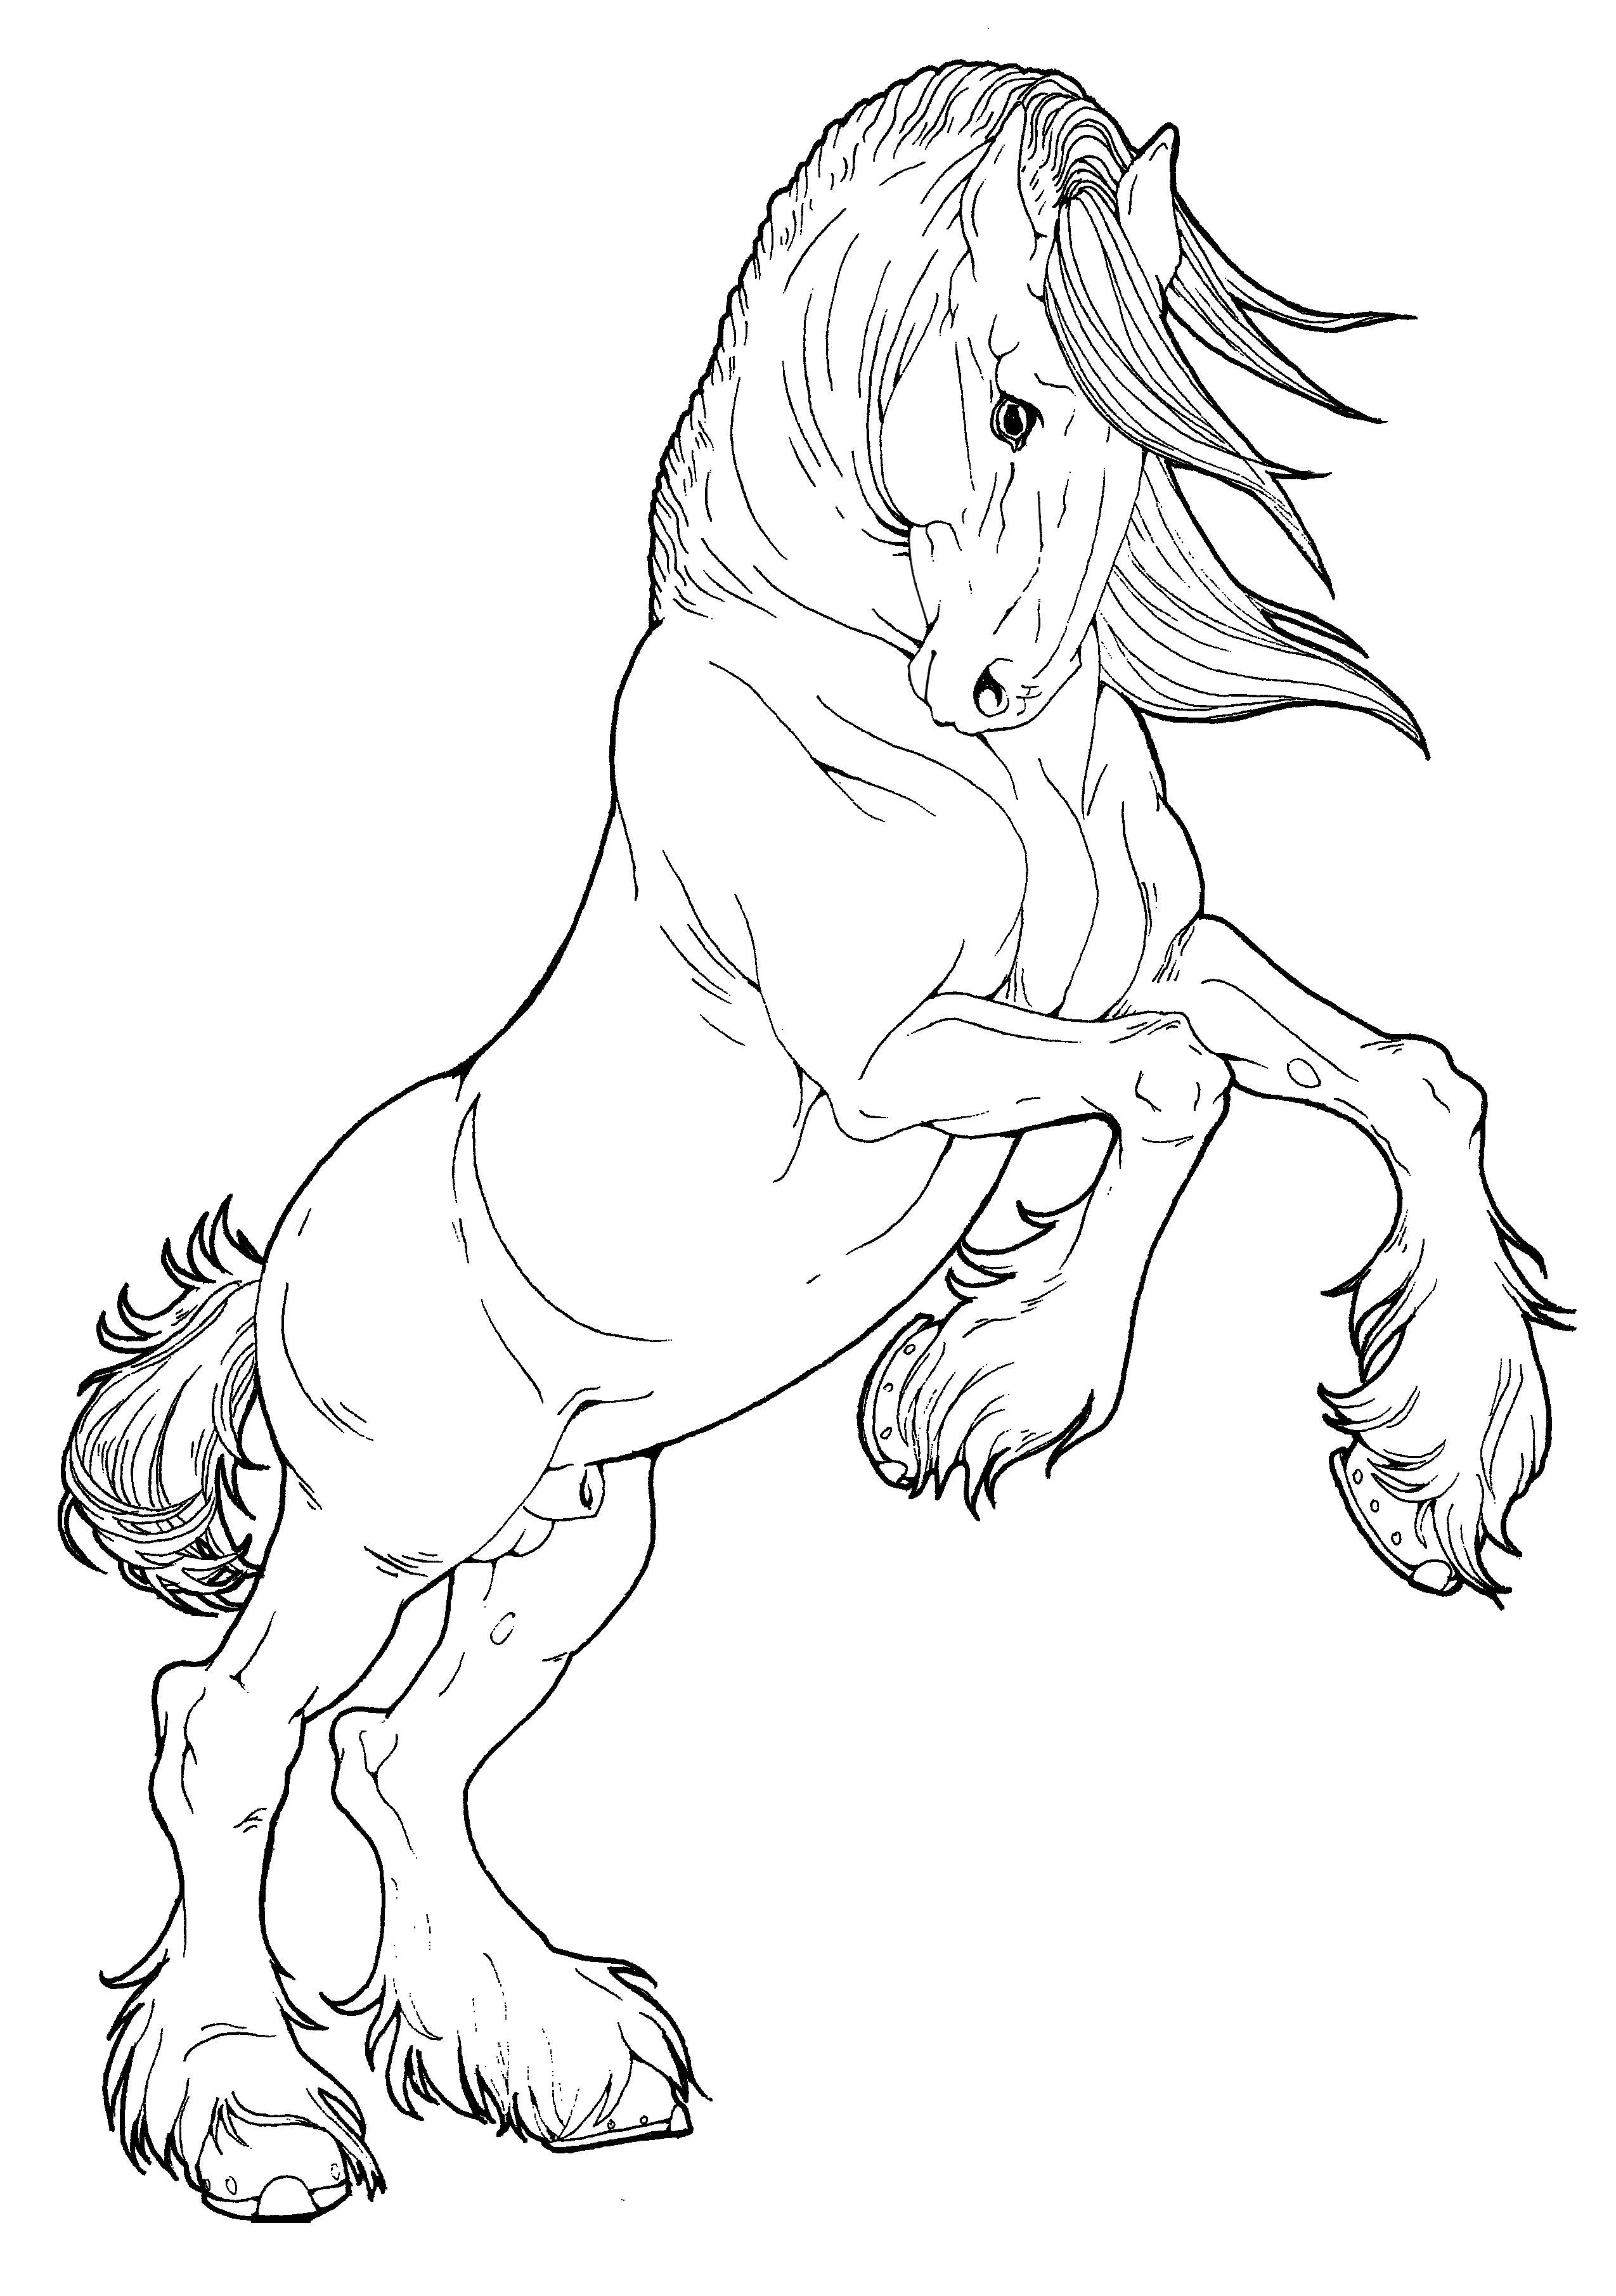 2549x3622 Draft Horse Sketch This Would Be An Awesome Tatt! Kolorowanki